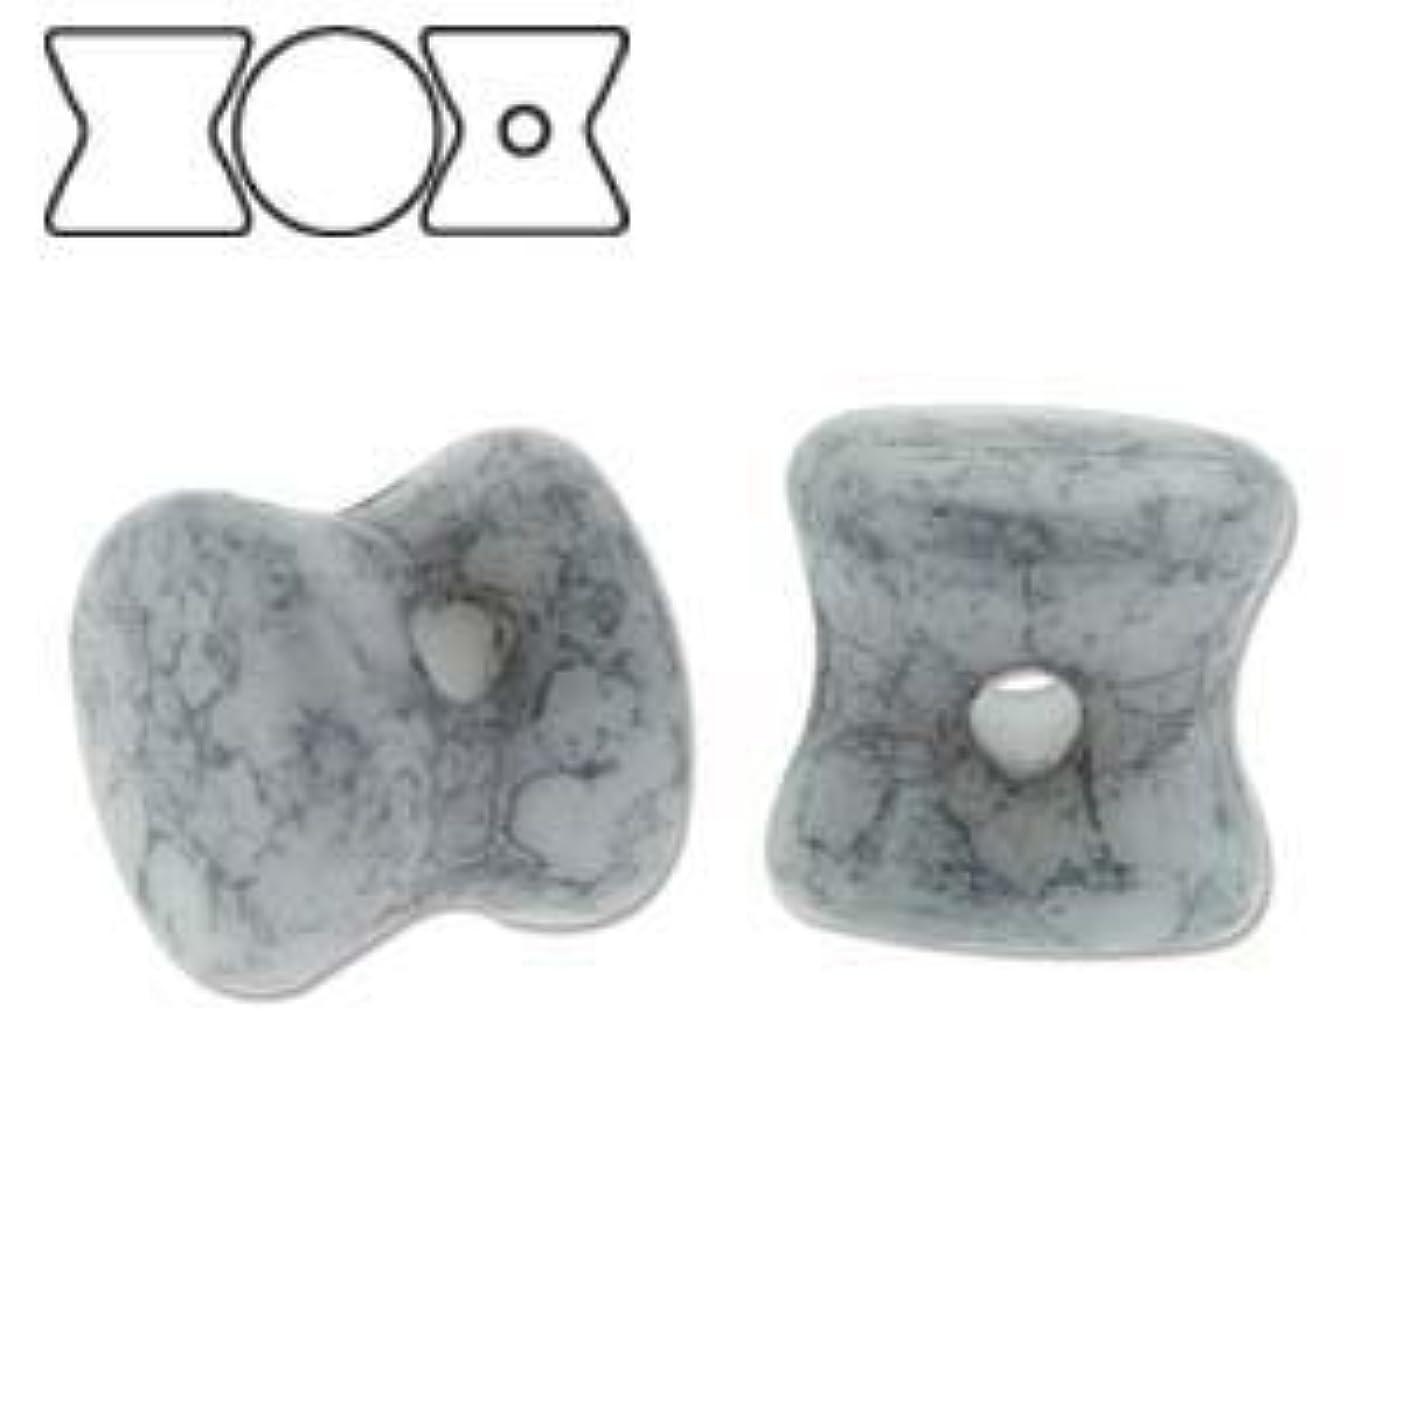 Czech Glass Pellet Beads 4 x 6mm Chalk White Trct Blue (30)